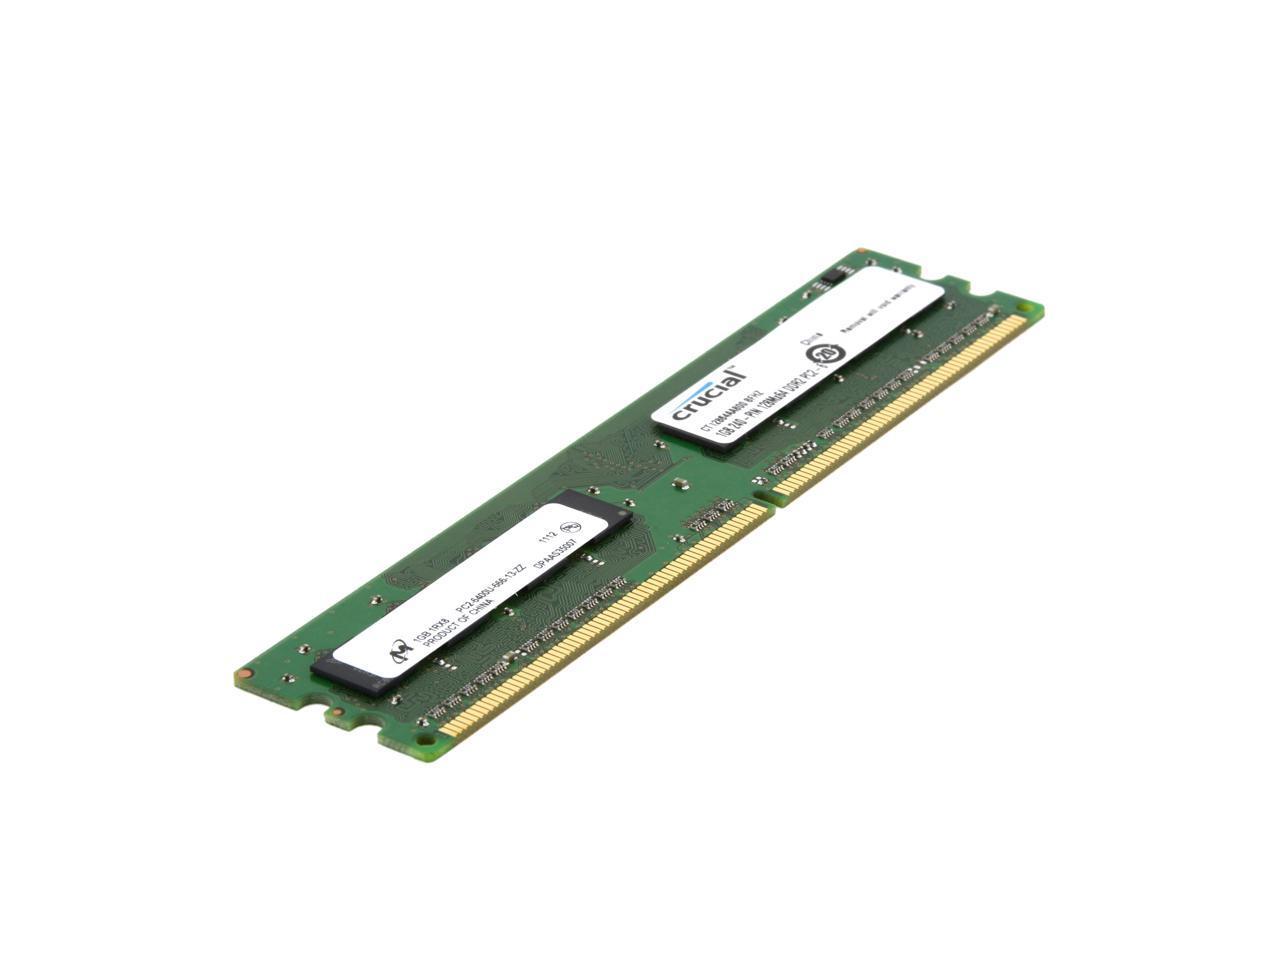 PC2-6400 RAM Memory Upgrade for the Intel IX38 QuadGT Desktop Board 1GB DDR2-800